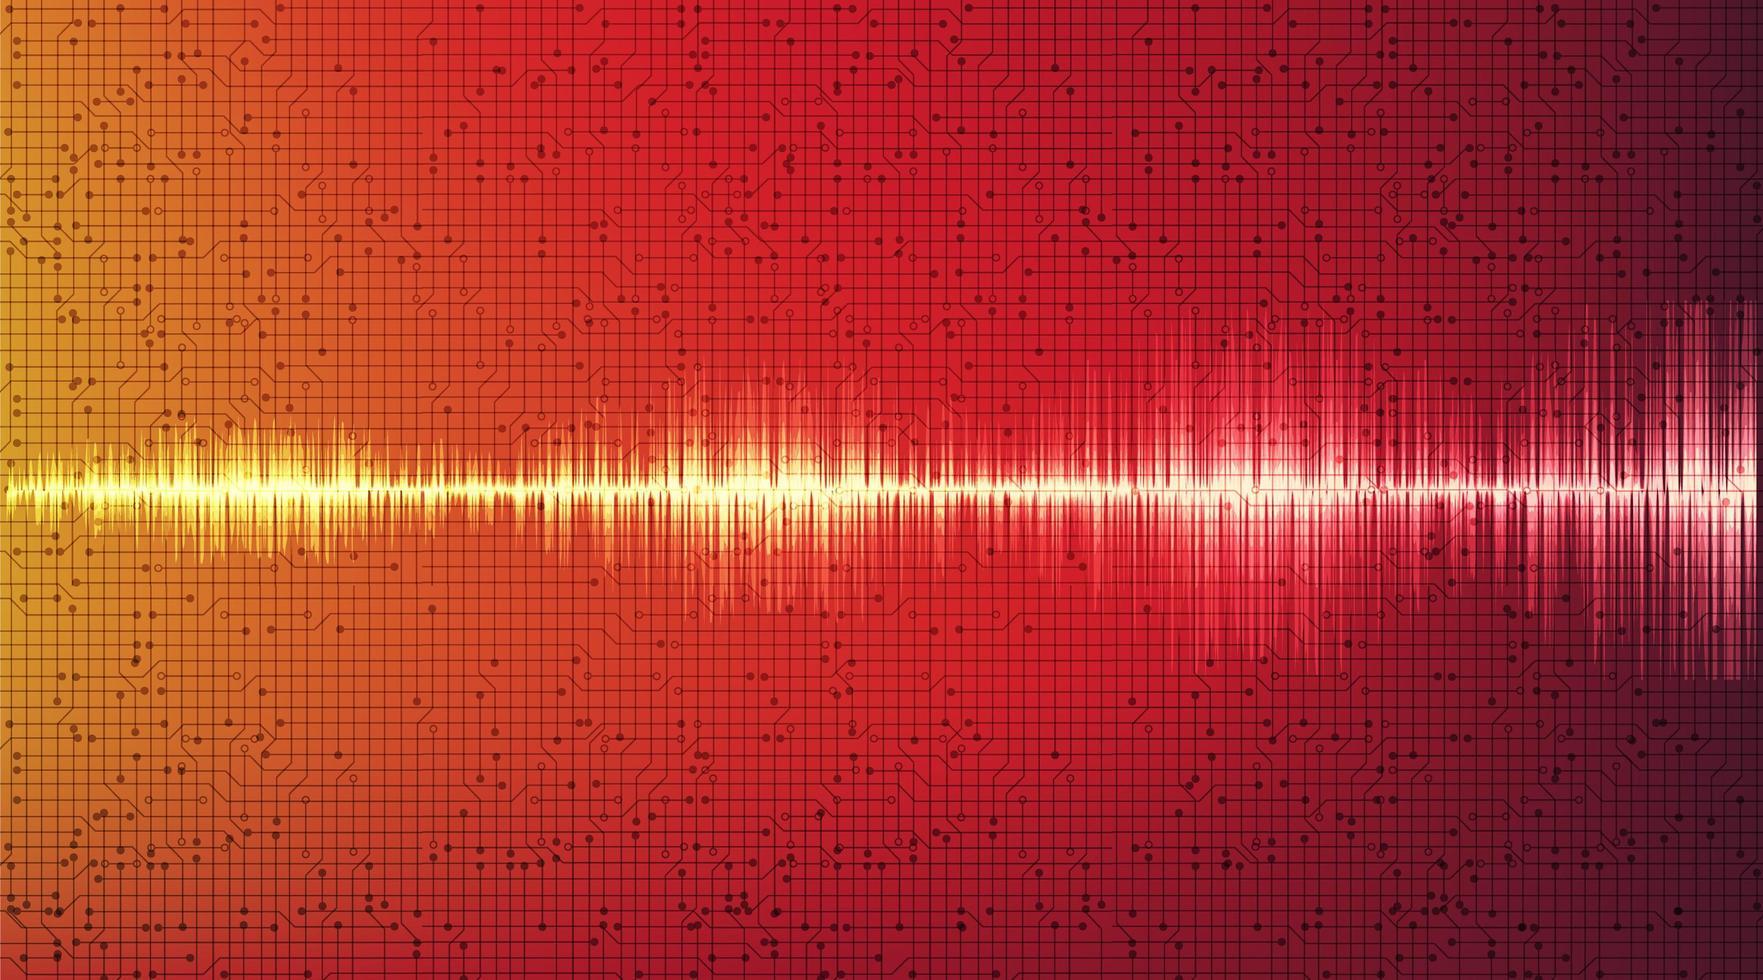 abstract rood digitaal geluidsgolf en aardbevingsgolfconcept vector